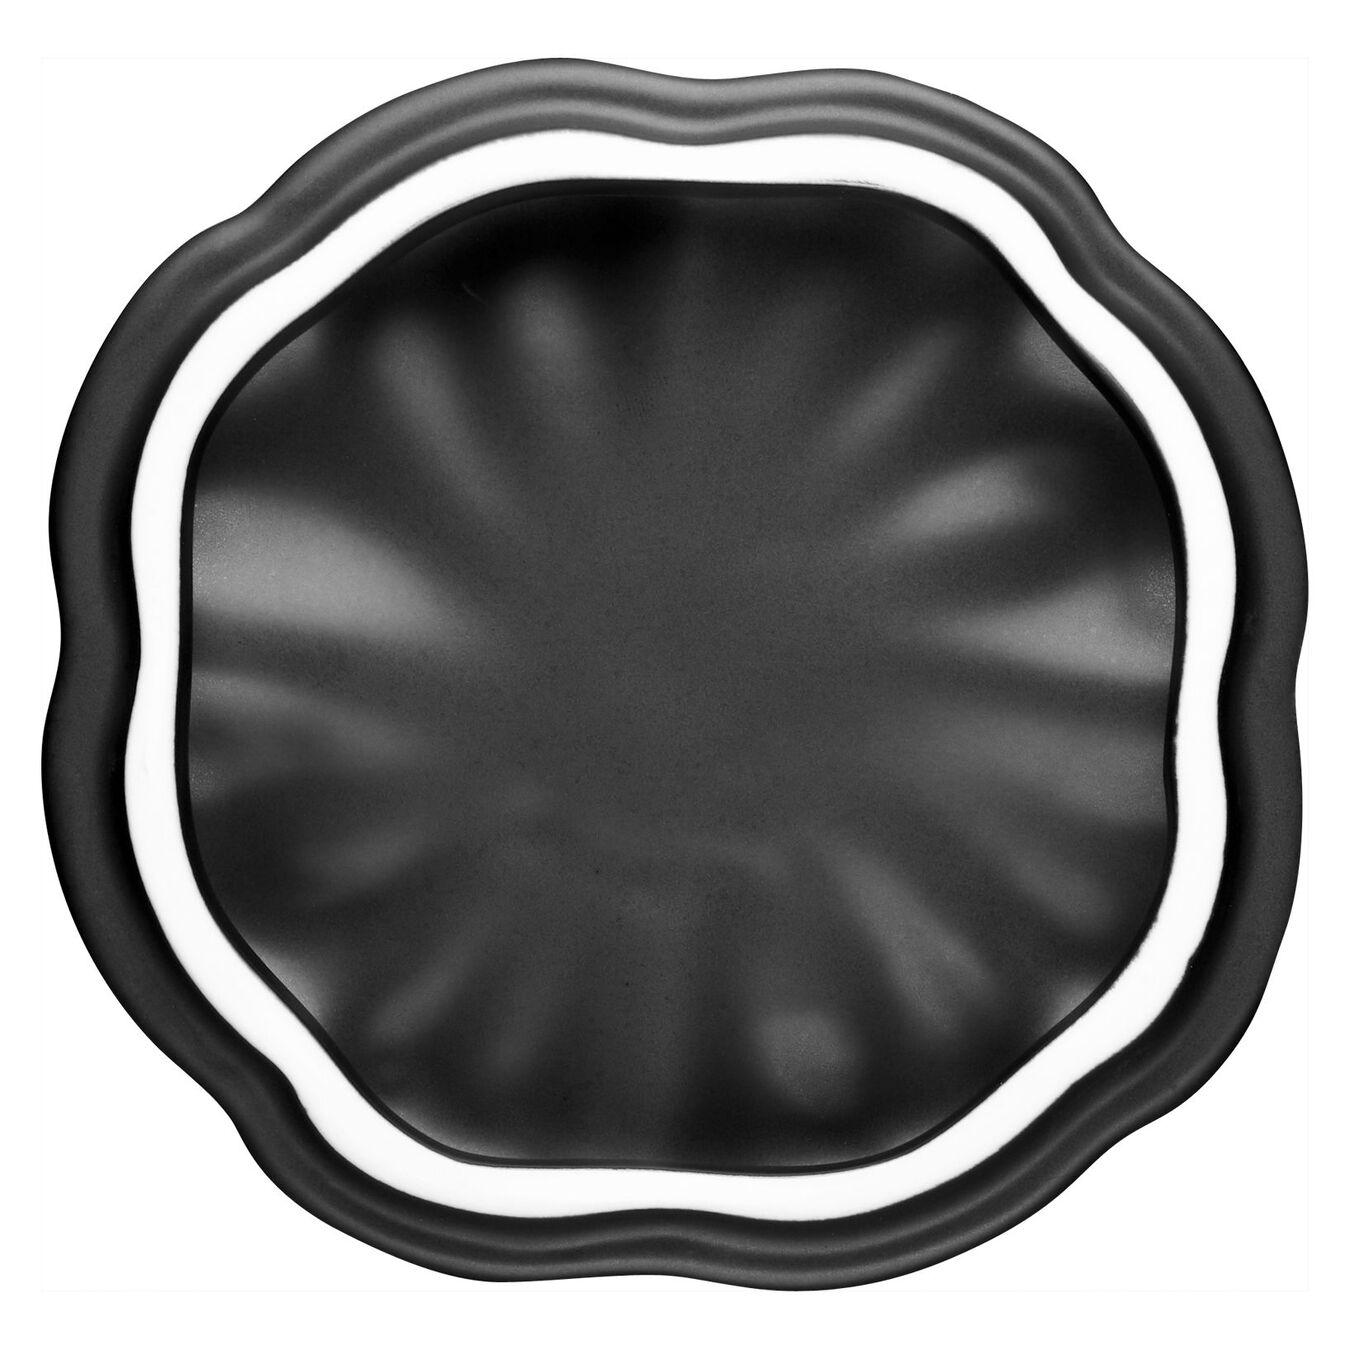 Cocotte 15 cm, Kürbis, Schwarz, Keramik,,large 6